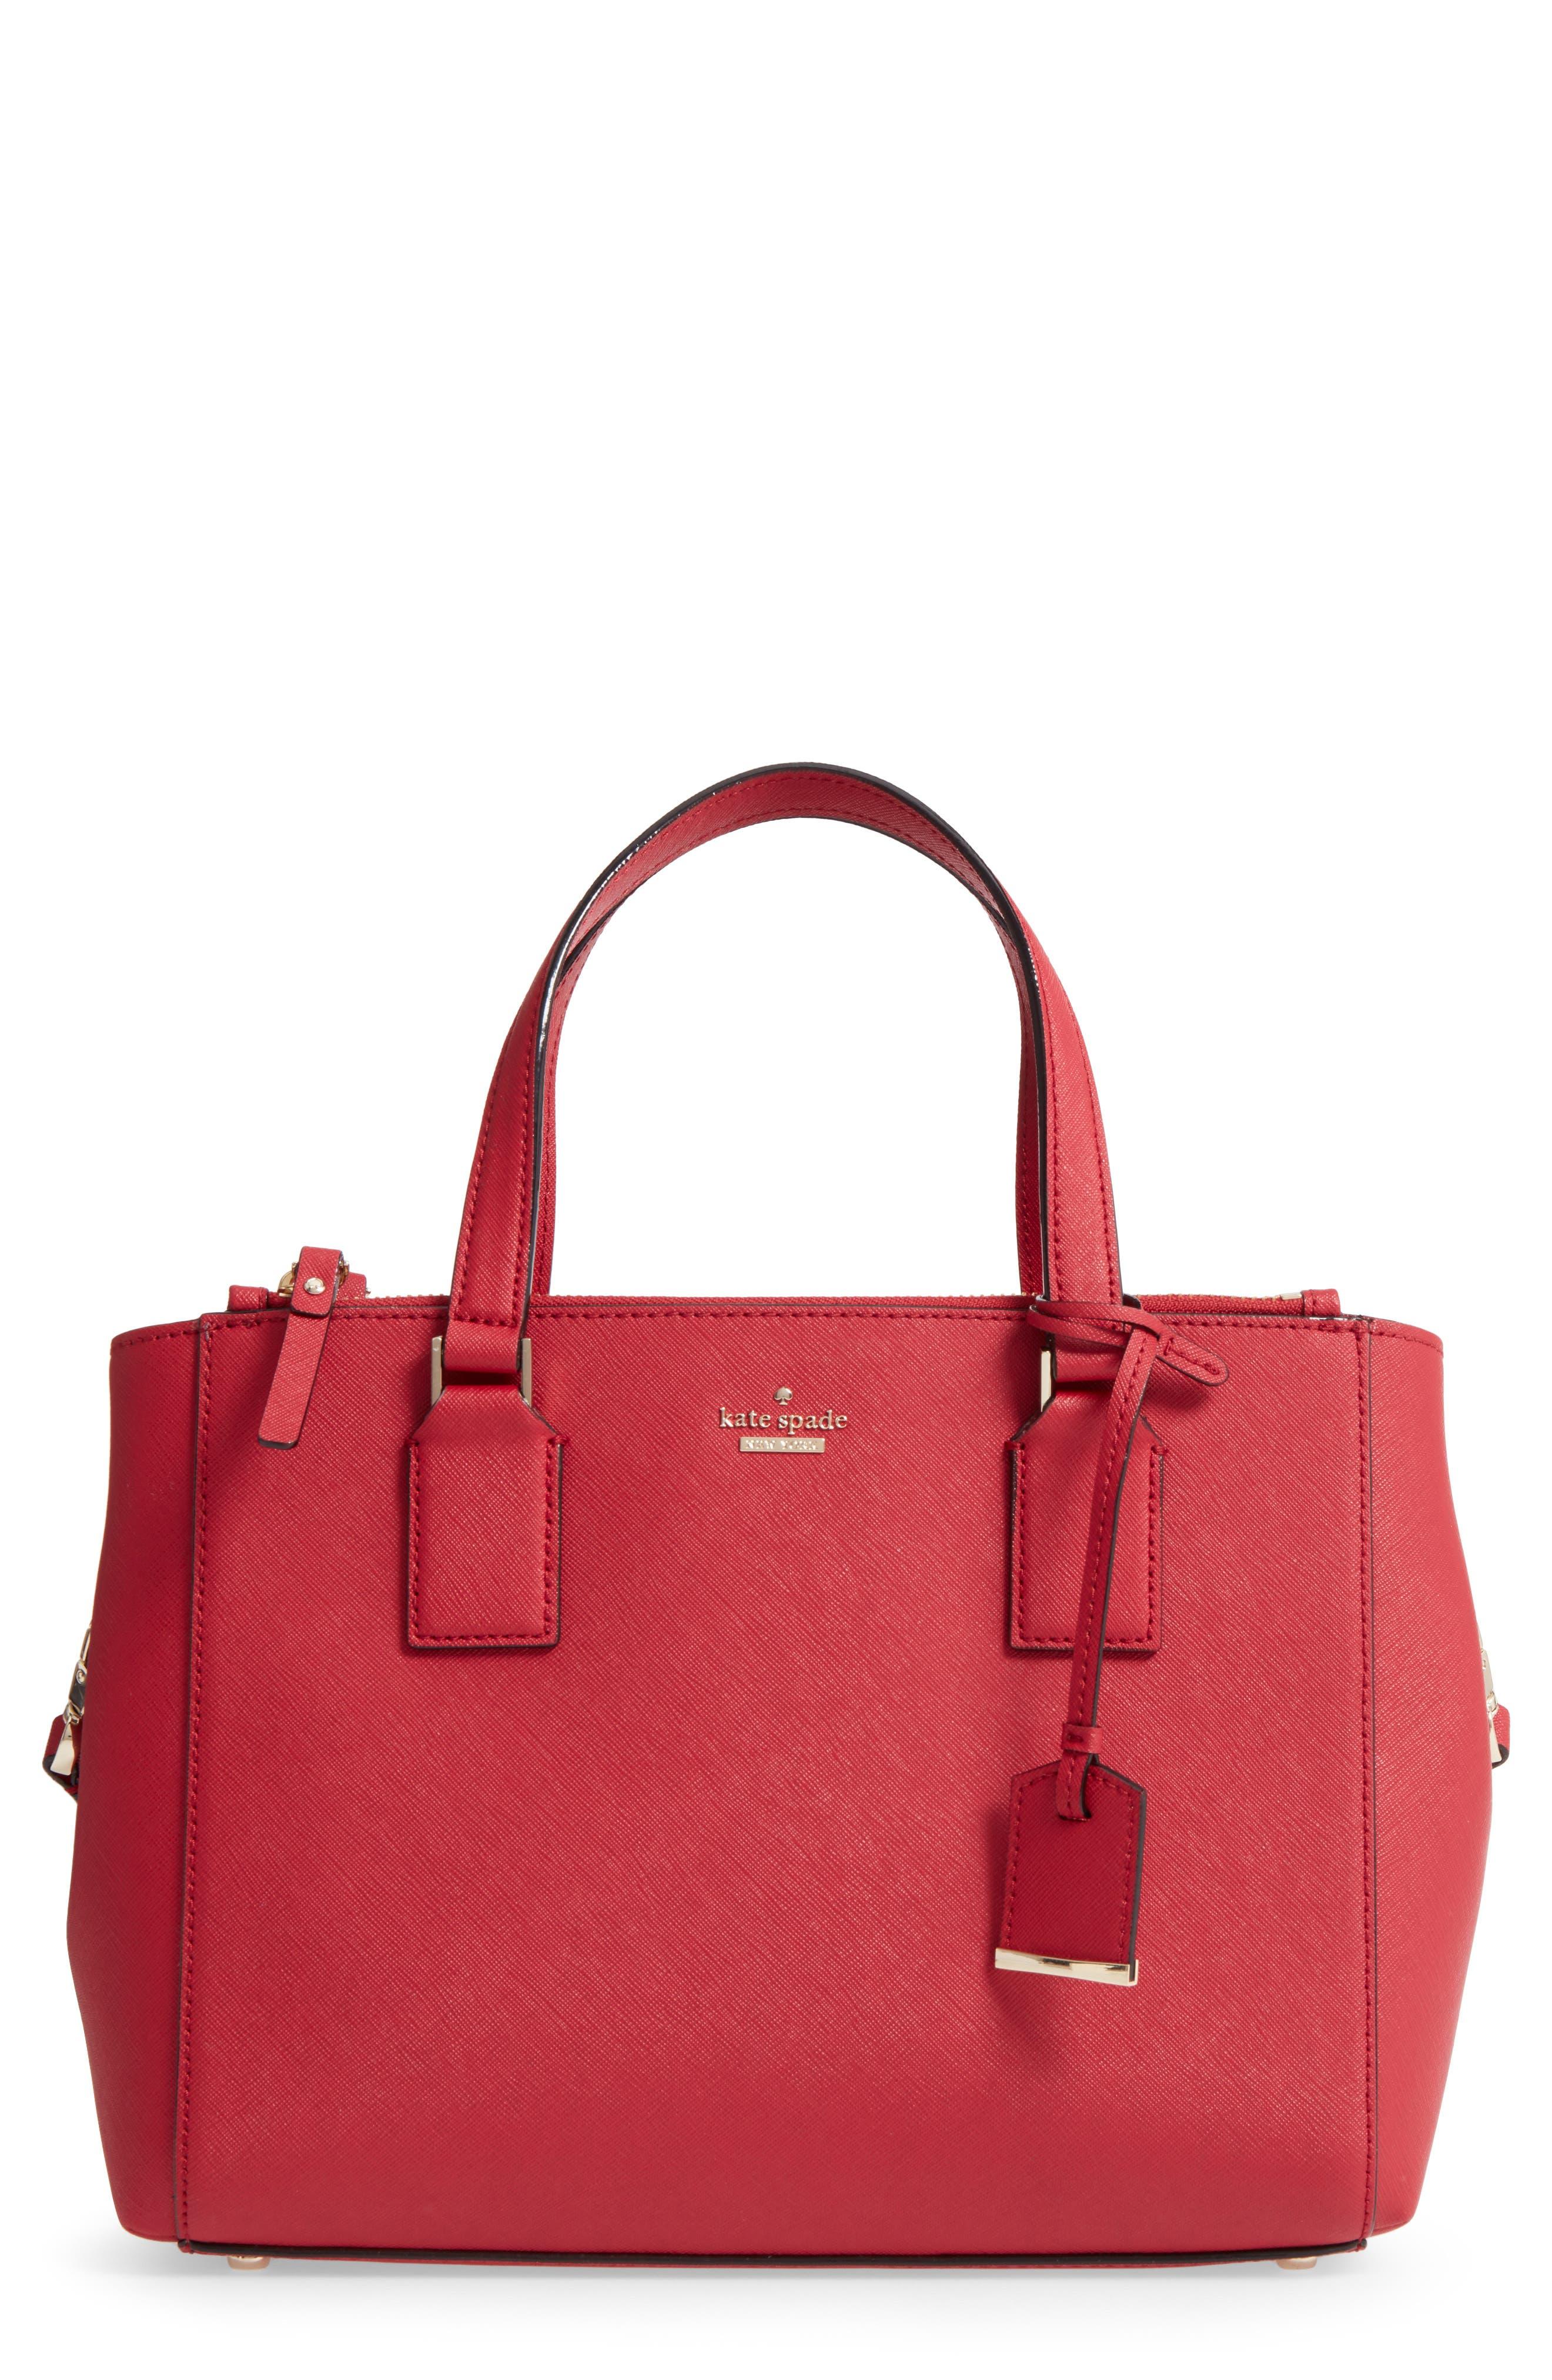 cameron street - teegan calfskin leather satchel,                             Main thumbnail 1, color,                             638